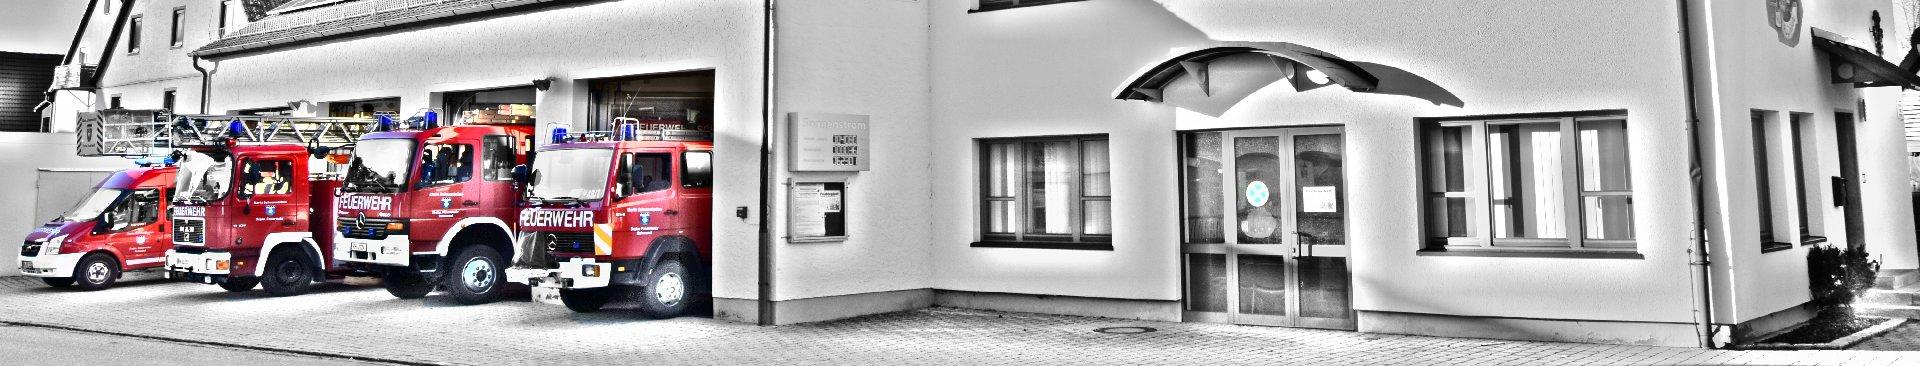 FW-Haus_SW_2